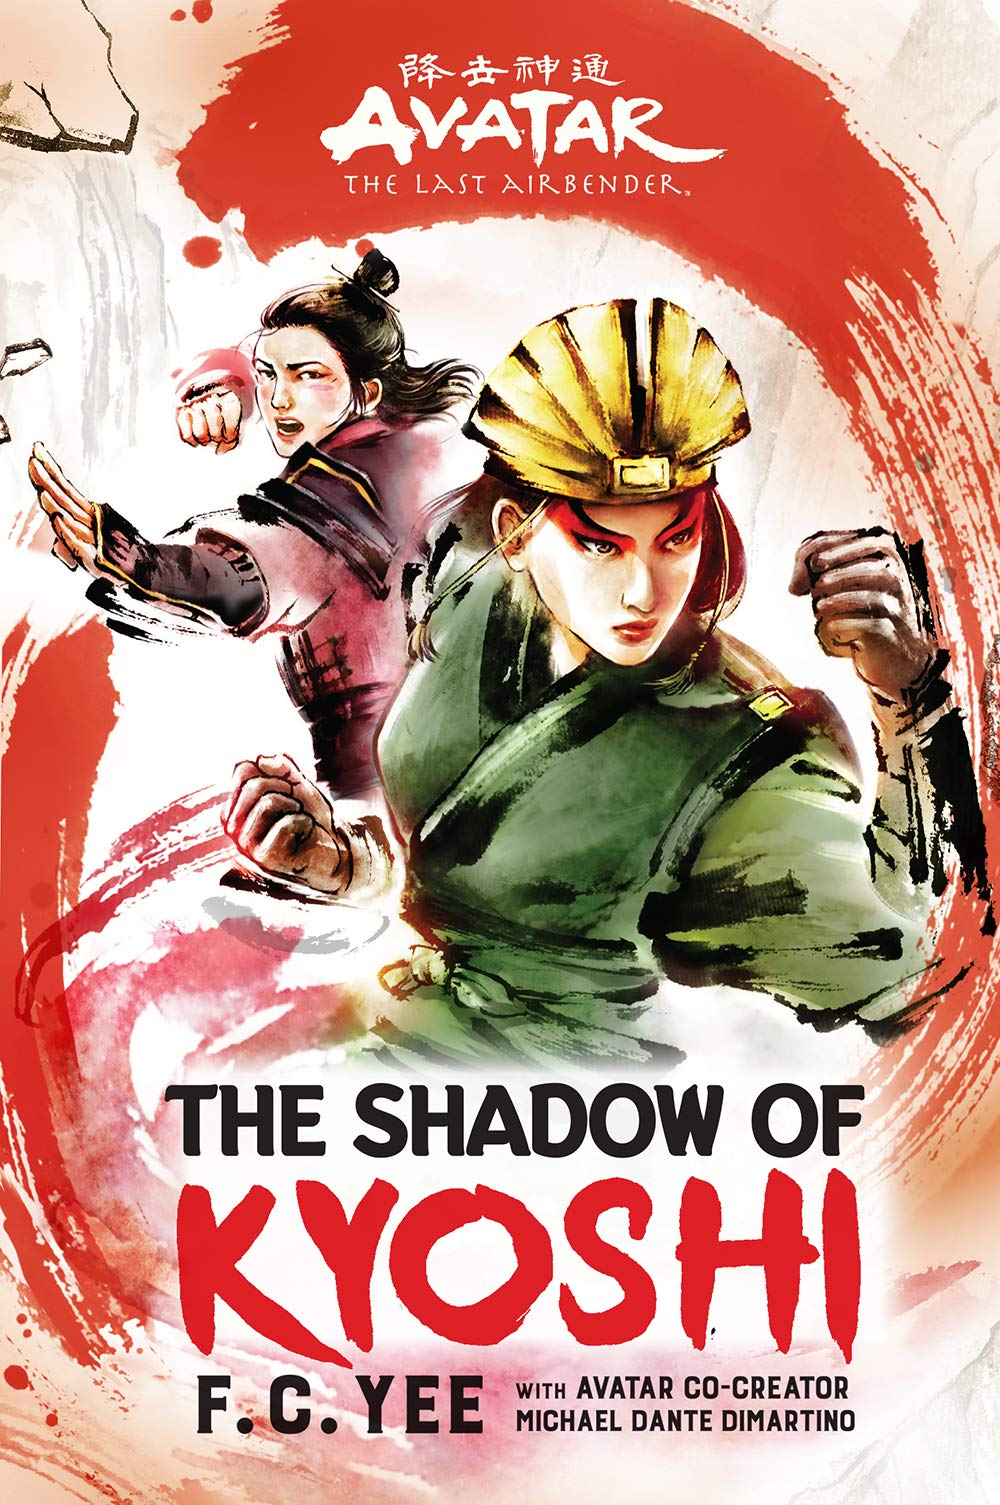 couverture de The Shadow of Kyoshi de F.C. Yee